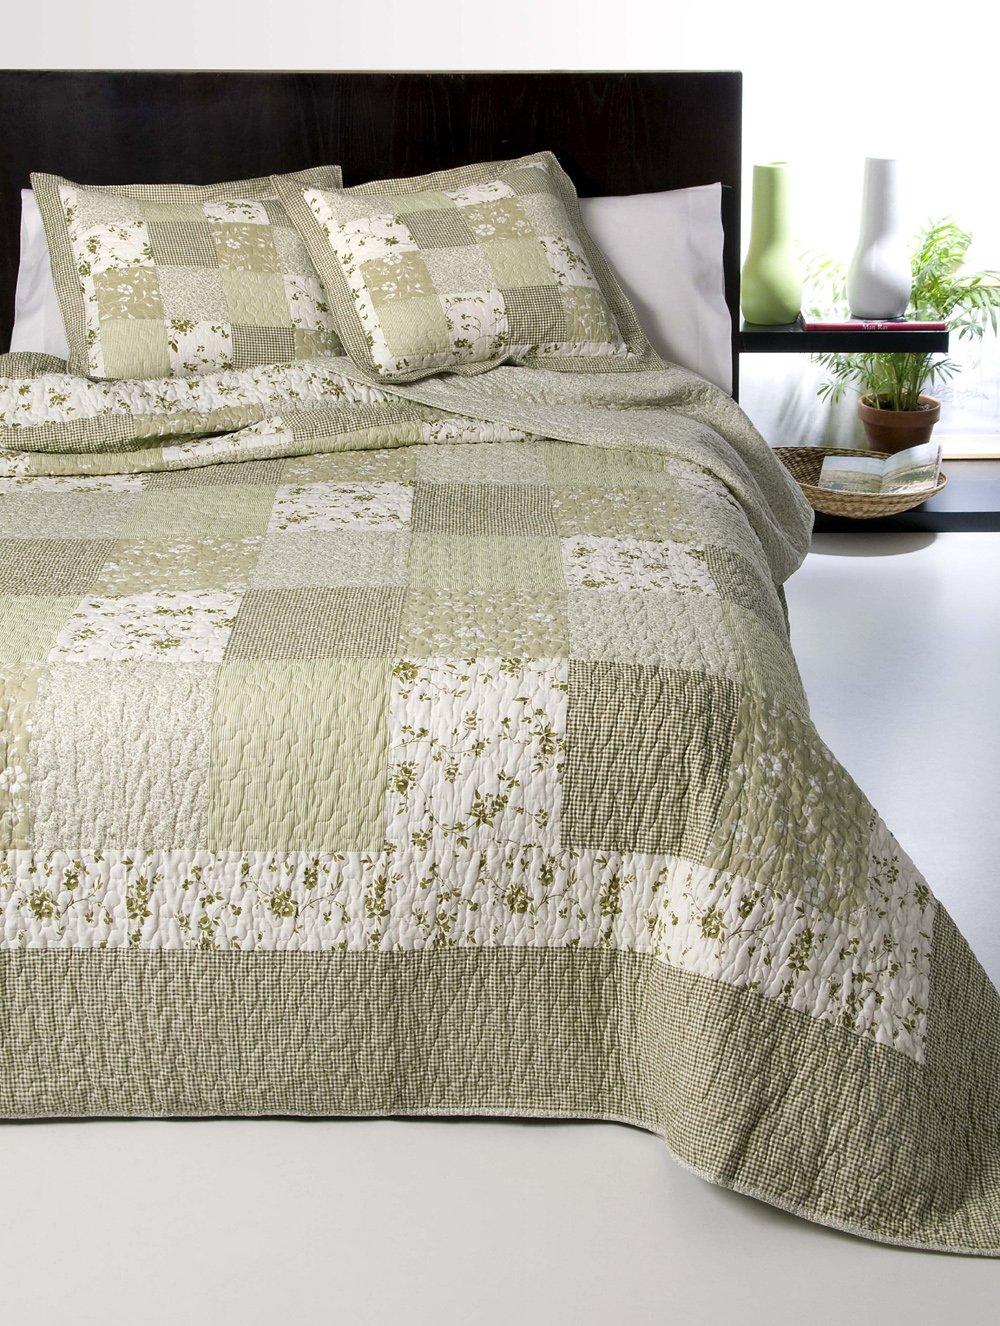 Colcha bouti algodón patchwork real modelo Zulema - cama 135 - medida 235x270 Atenas